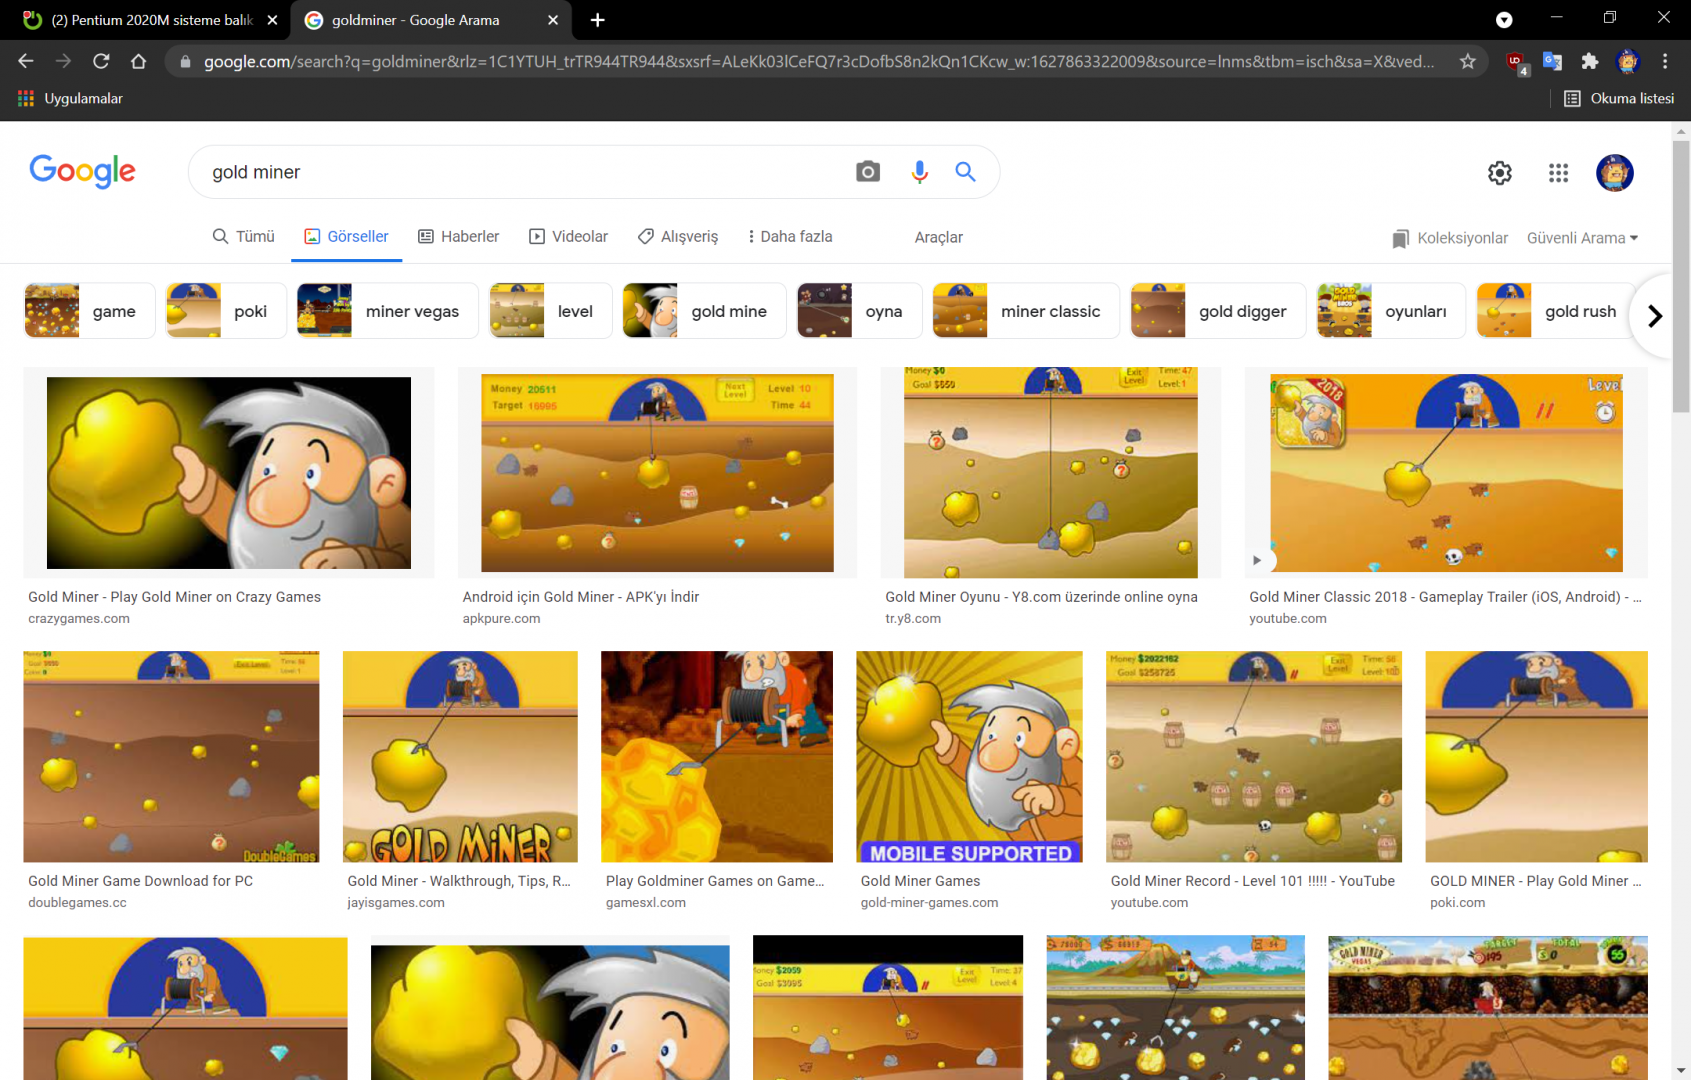 goldminer - Google Arama - Google Chrome 2.08.2021 03_15_53.png